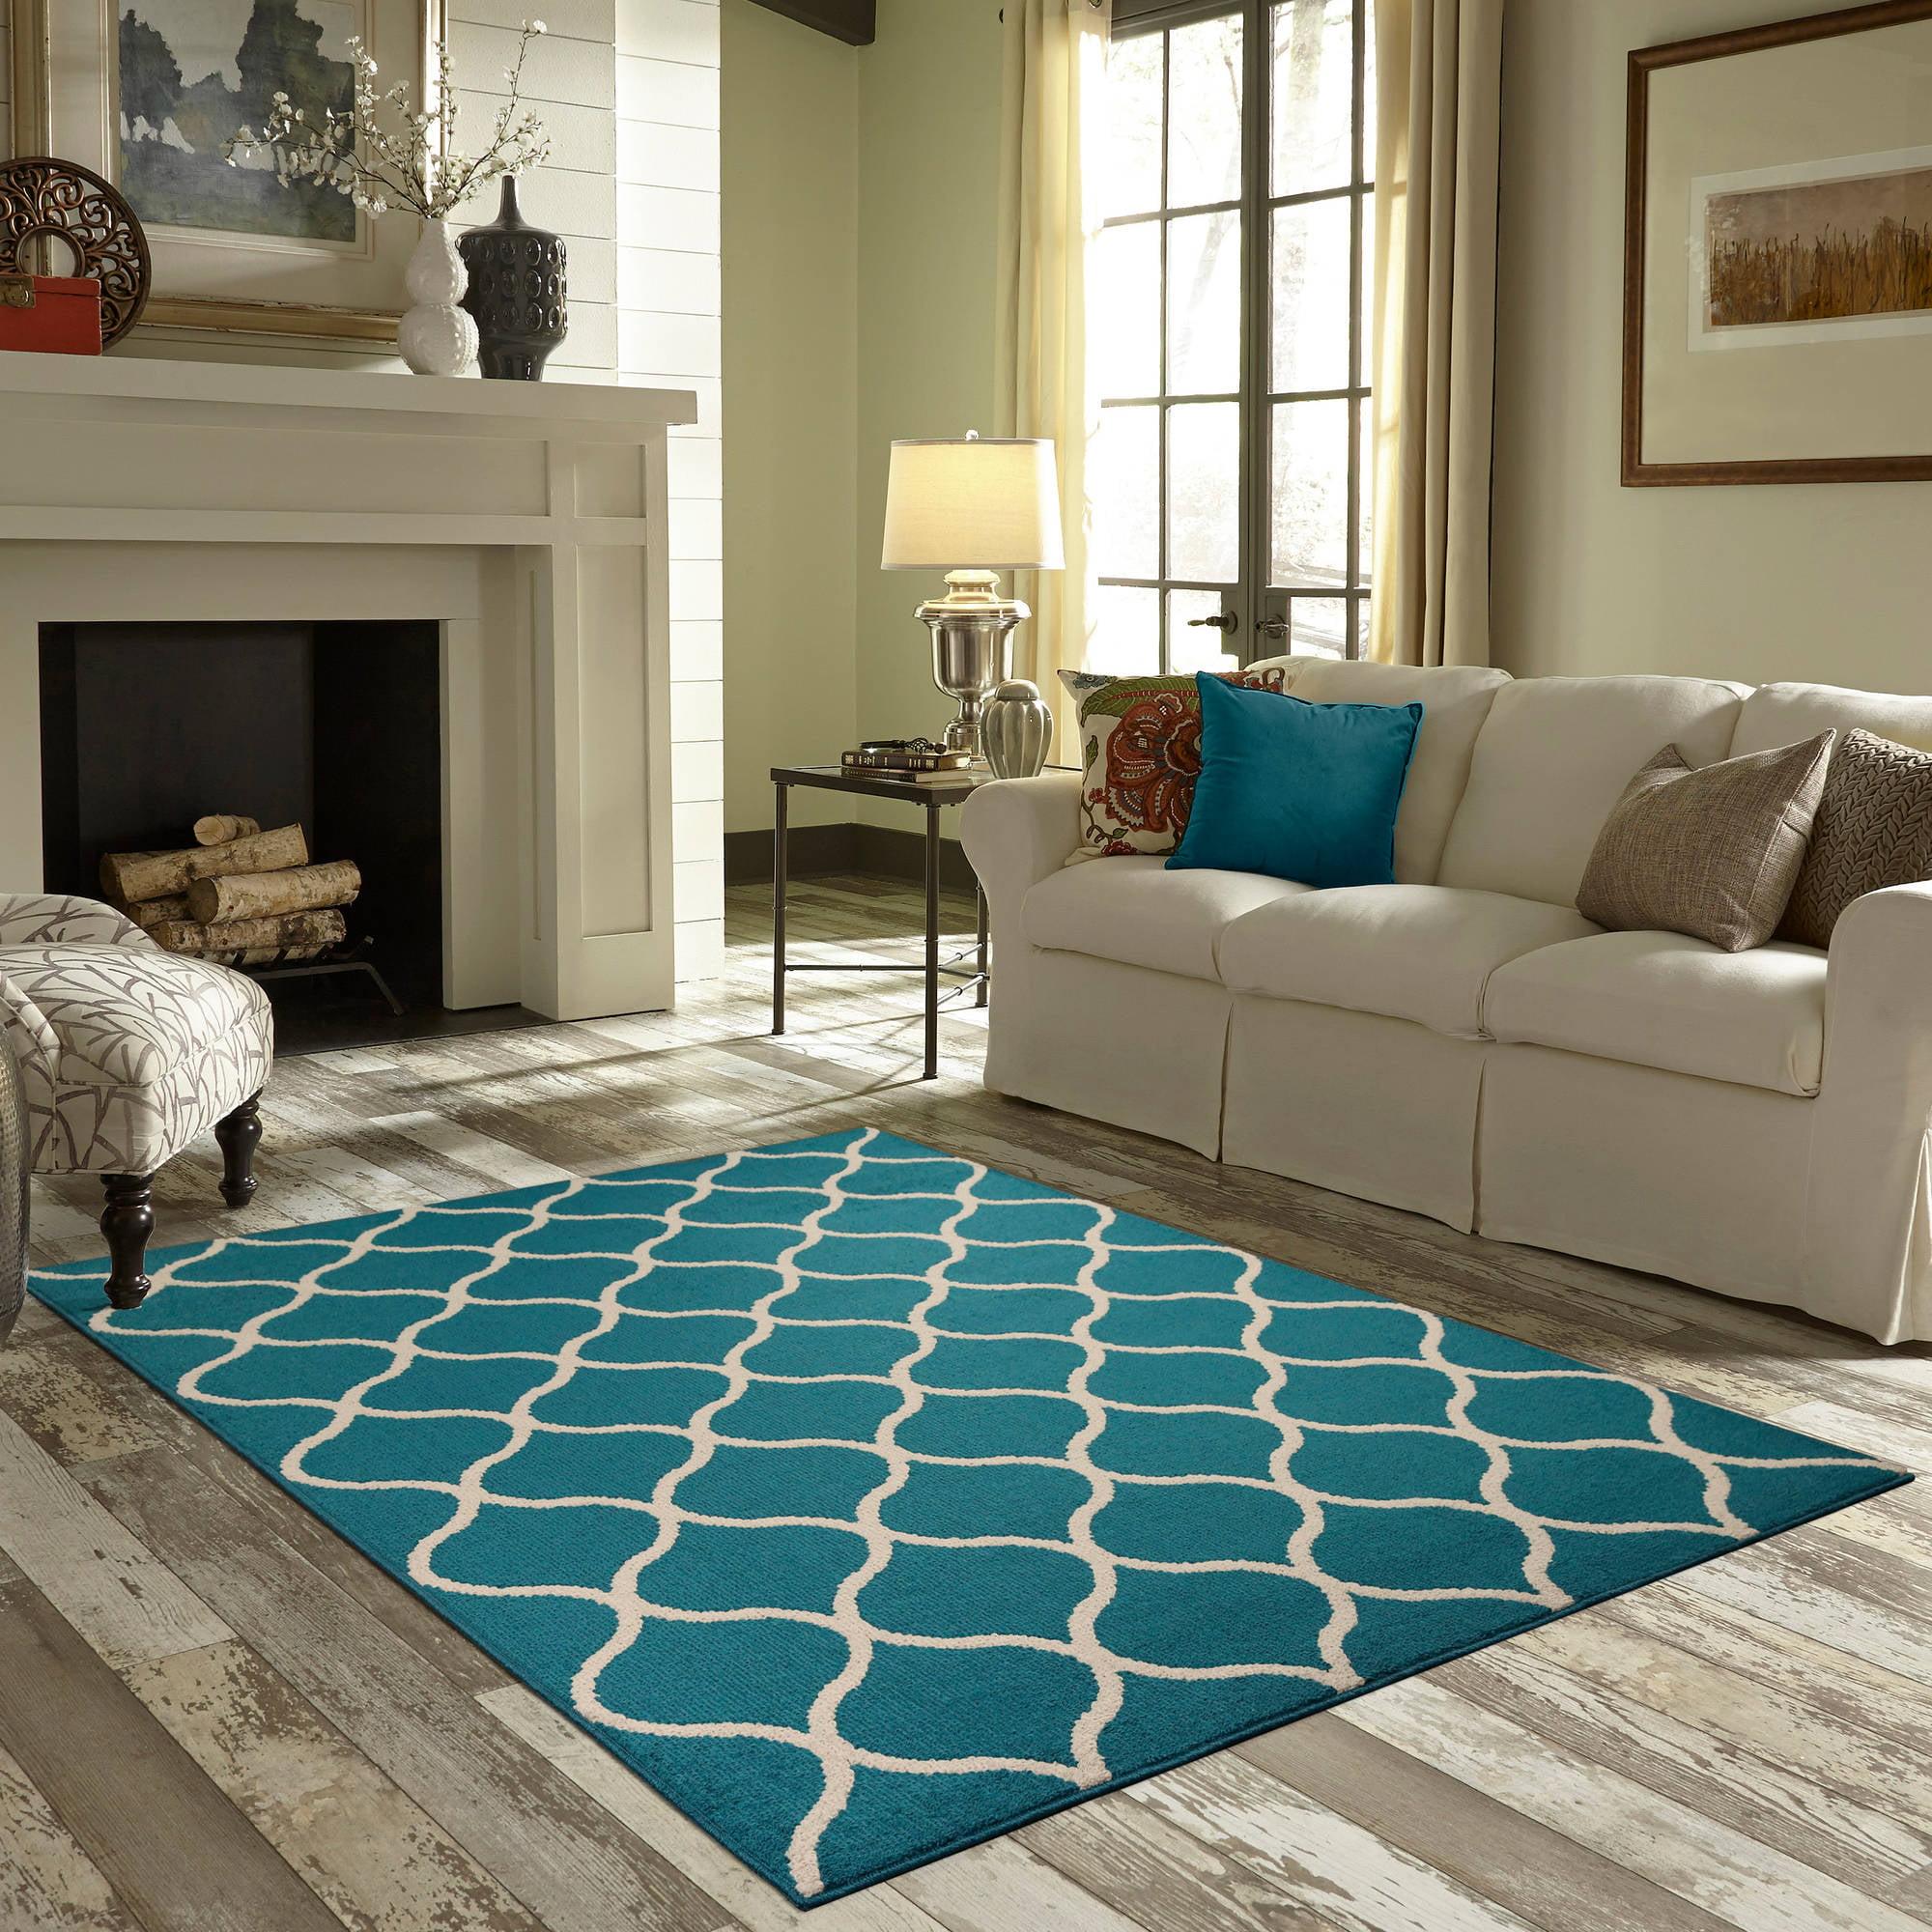 Area Rugs mainstays sheridan area rug or runner - walmart